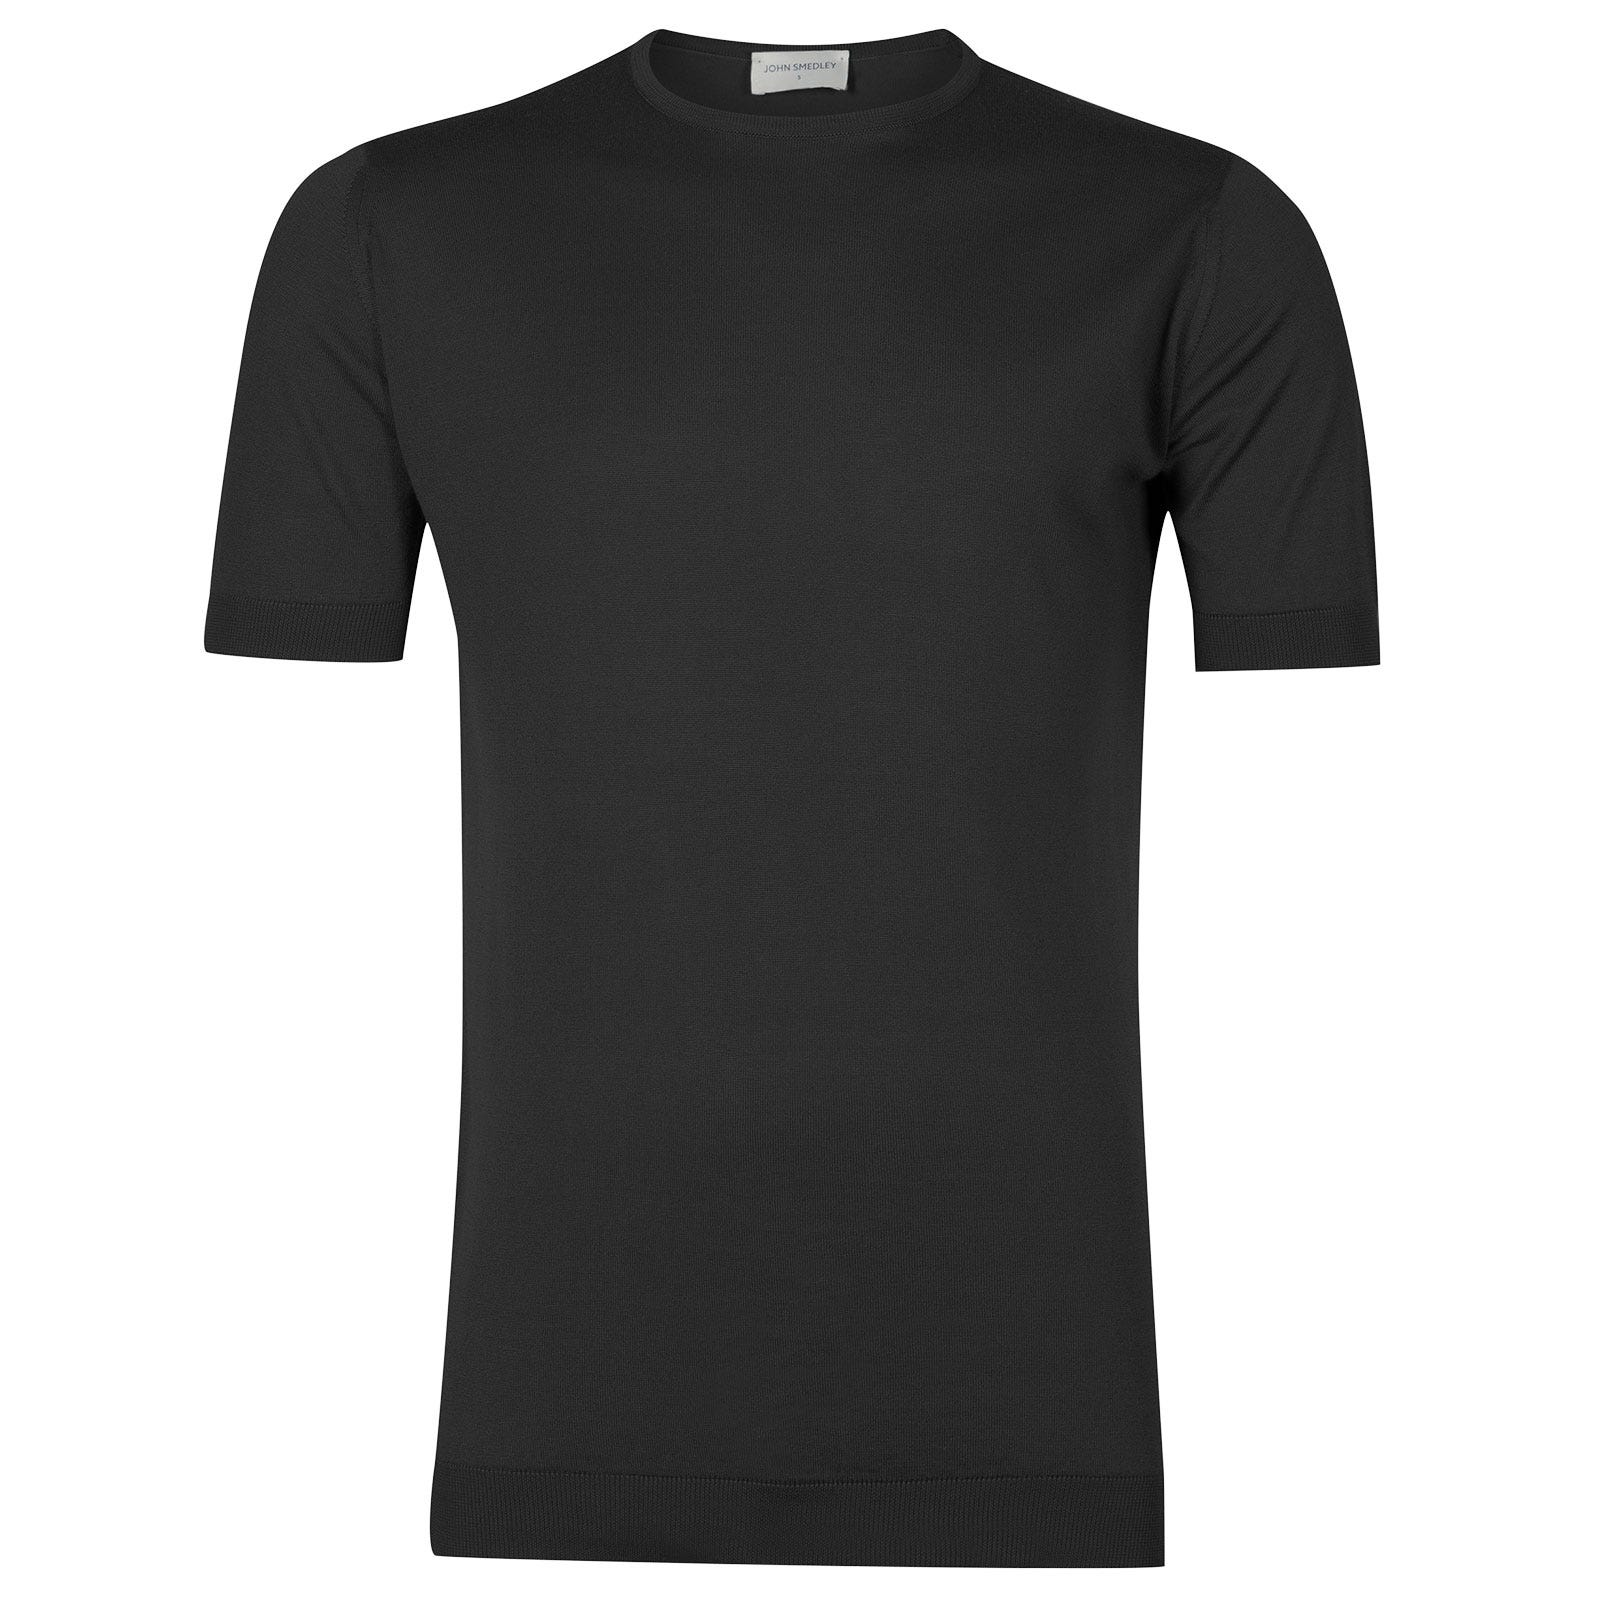 John Smedley Belden in Flannel Grey T-Shirt-MED